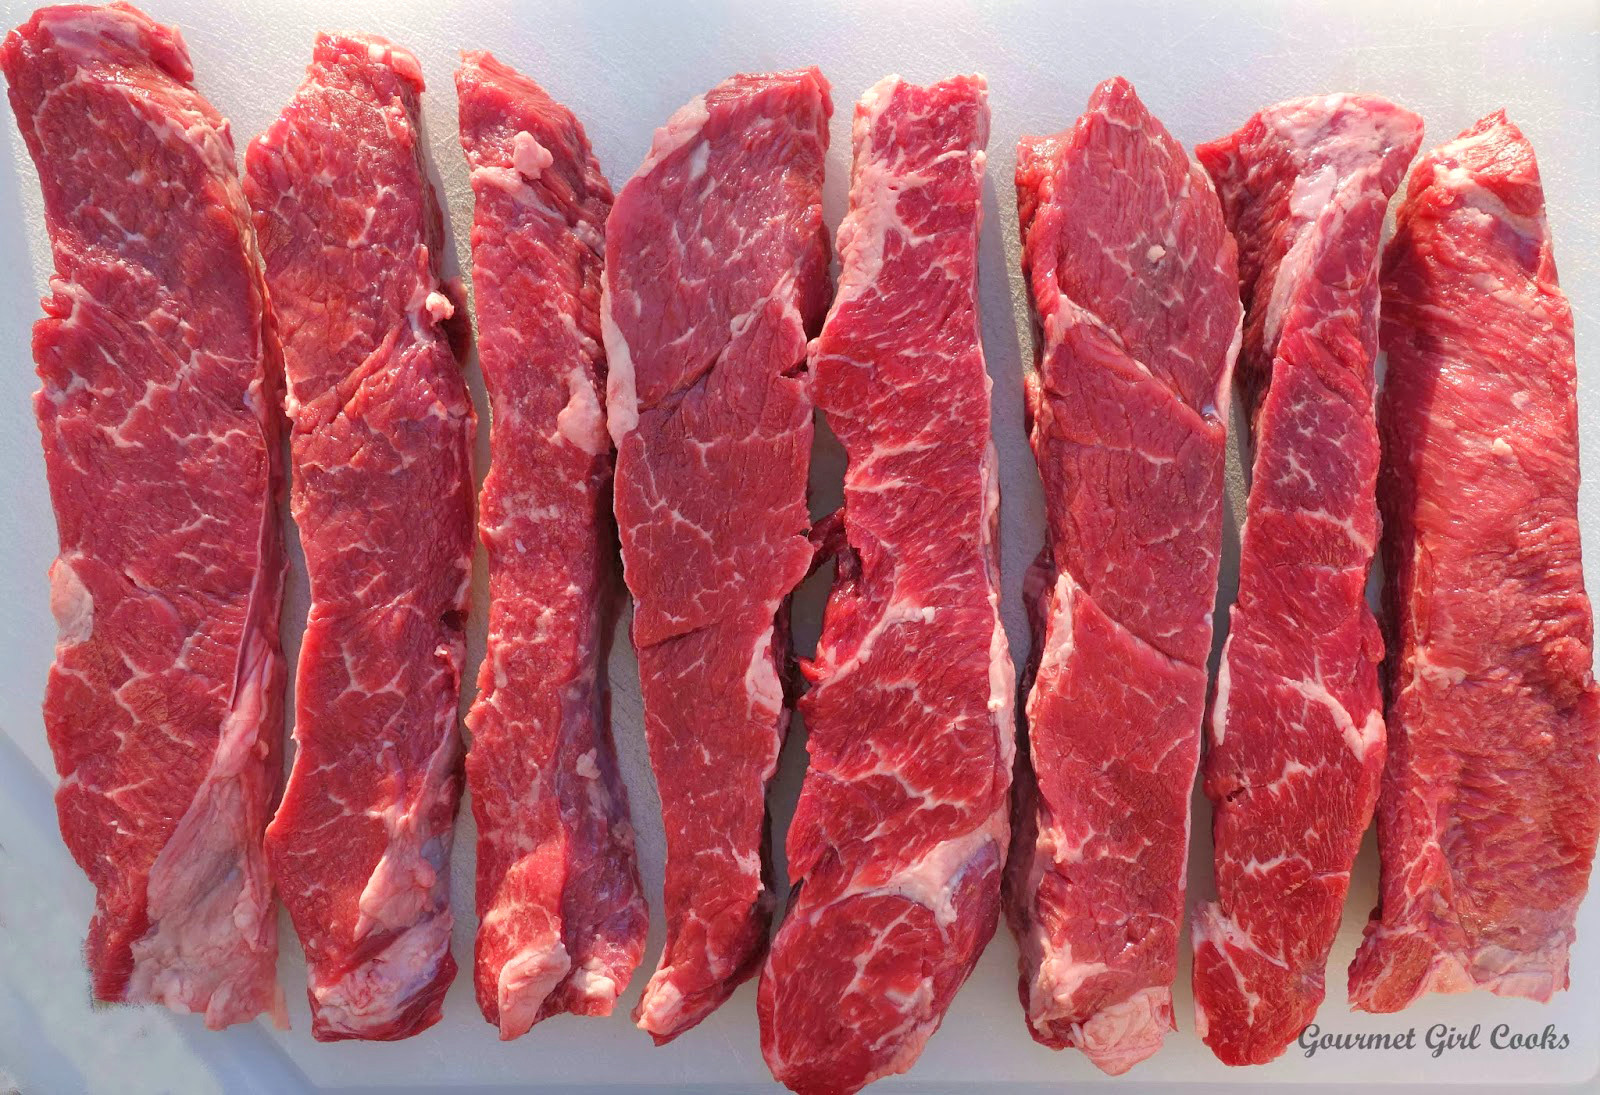 Slow Cooker Boneless Beef Ribs  Gourmet Girl Cooks Boneless Beef Chuck Short Ribs Slow